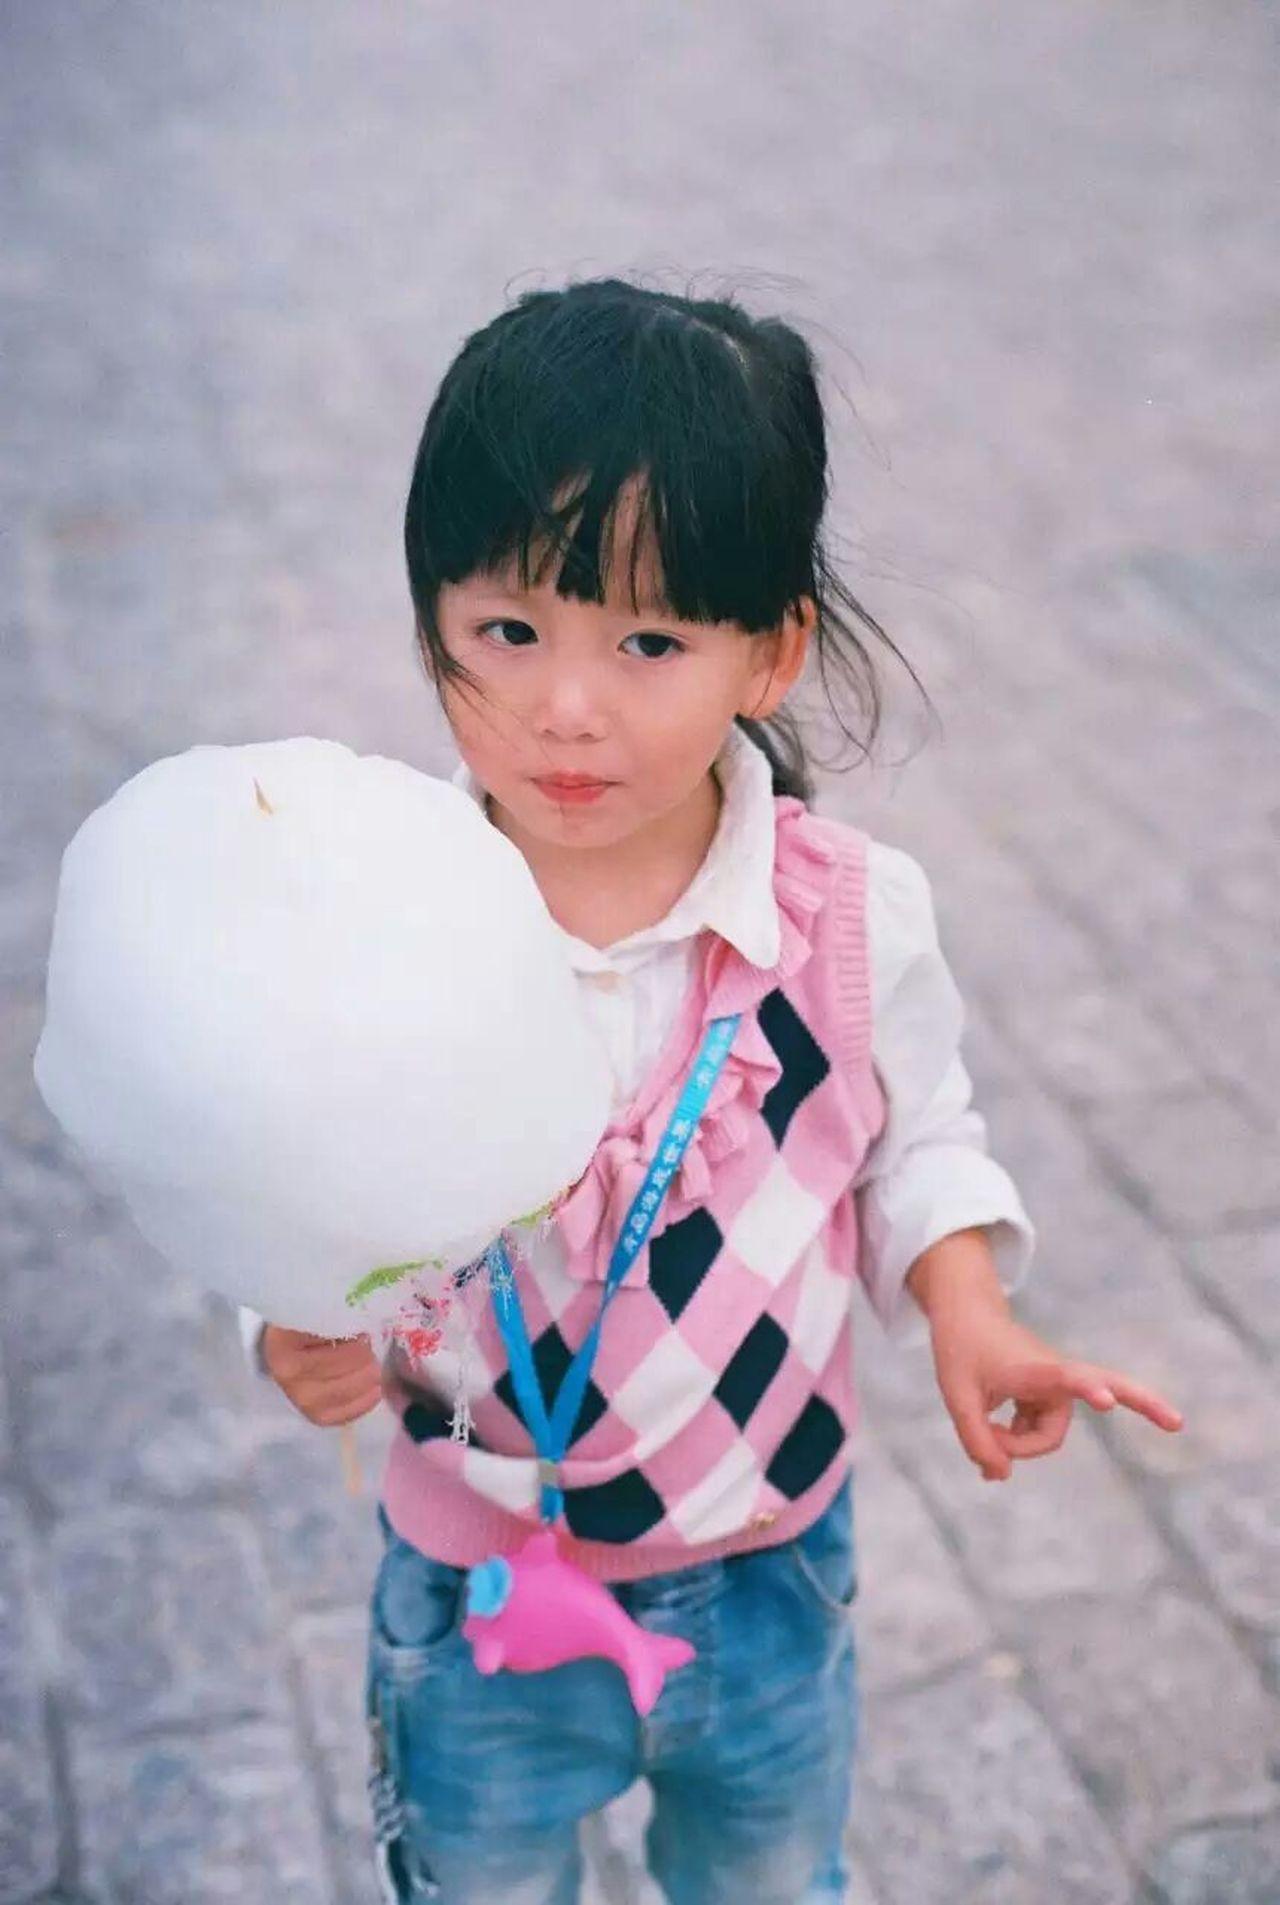 Beautiful stock photos of niedlich, child, childhood, innocence, portrait